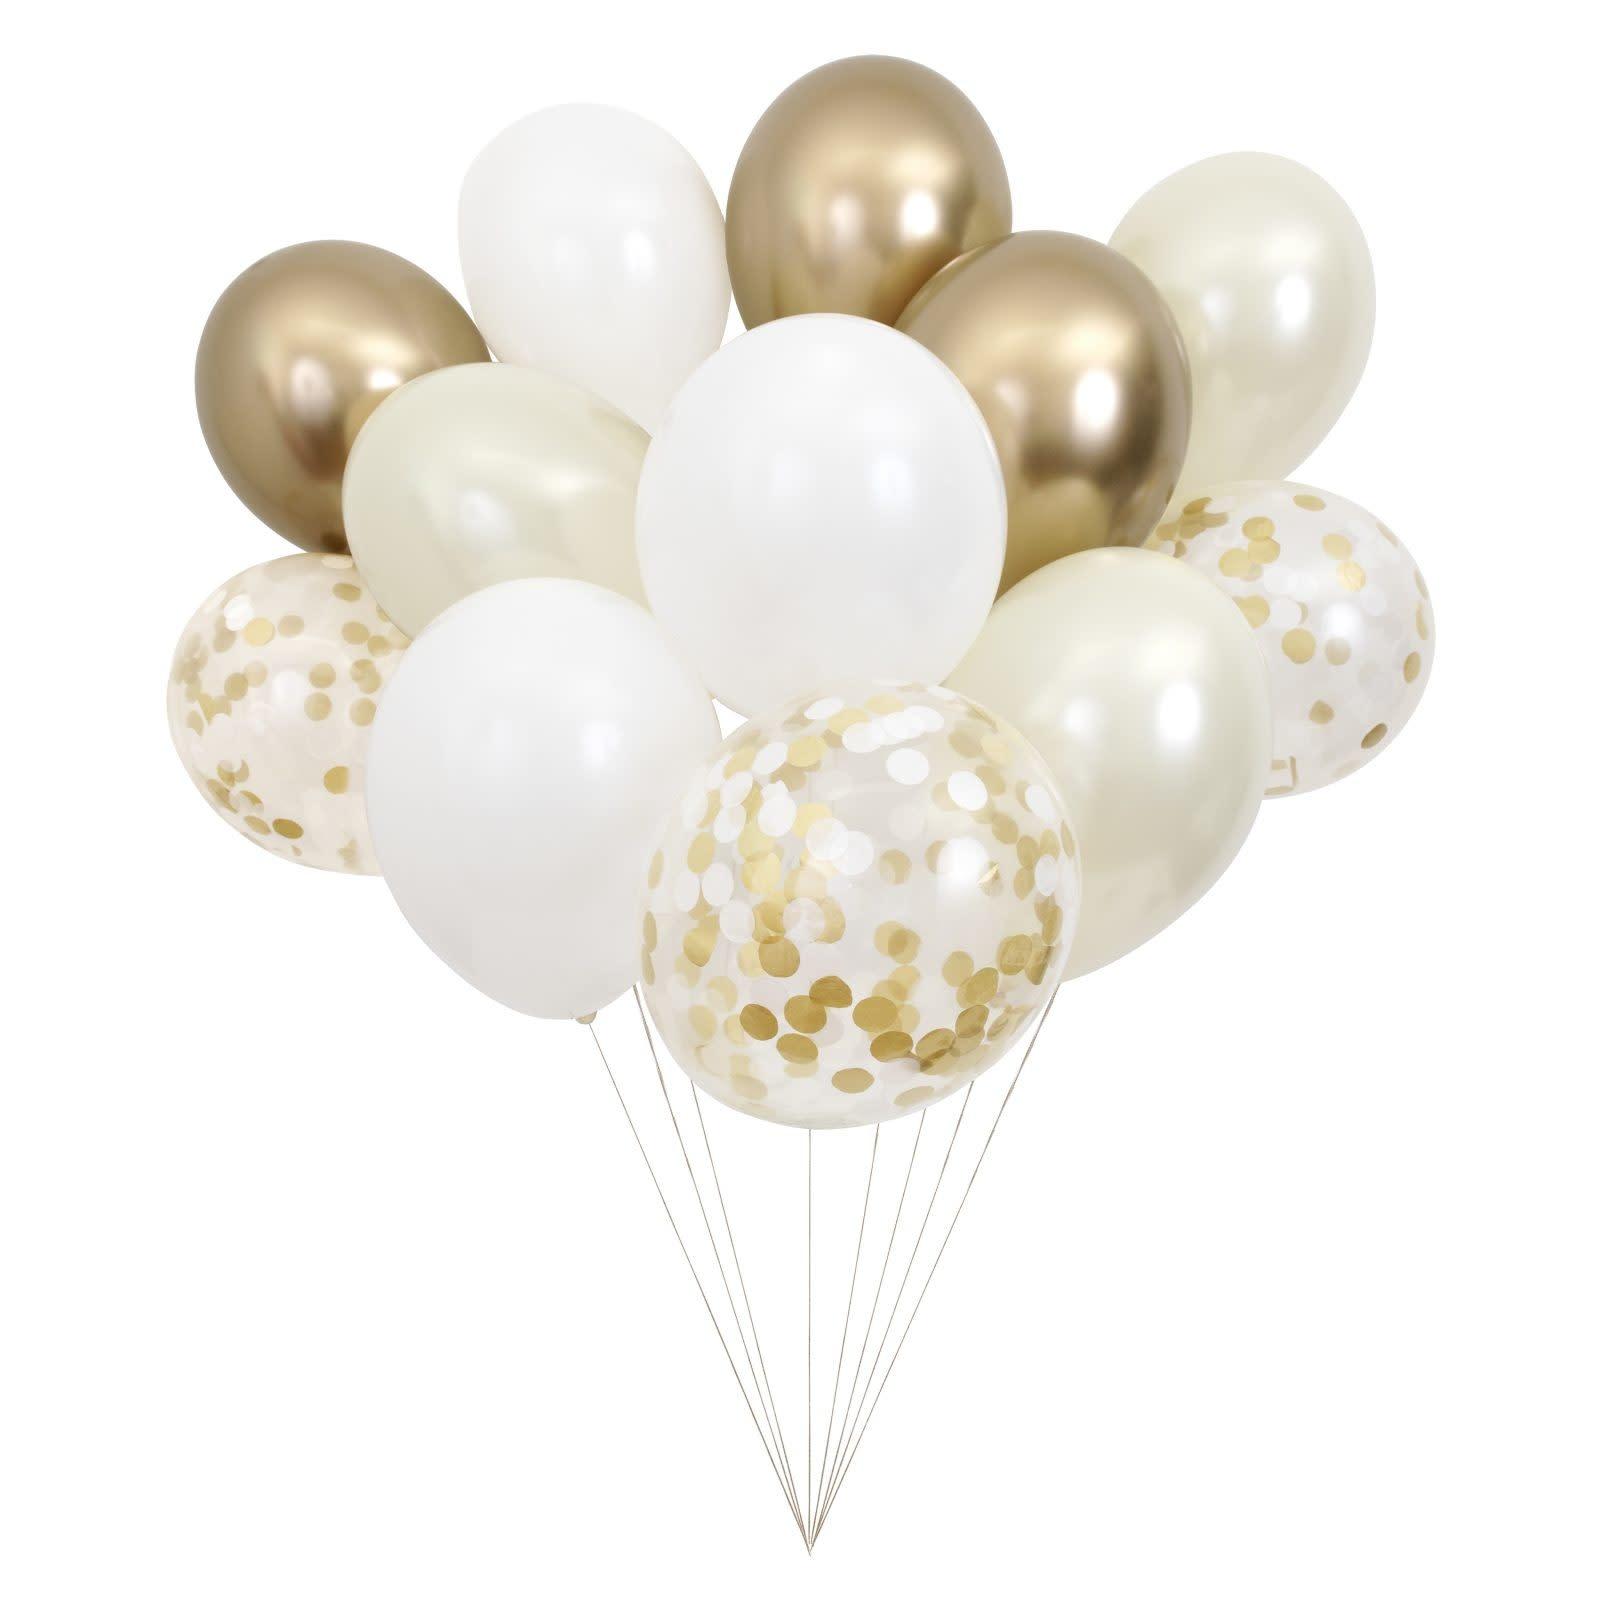 MERIMERI Beautiful balloons gold